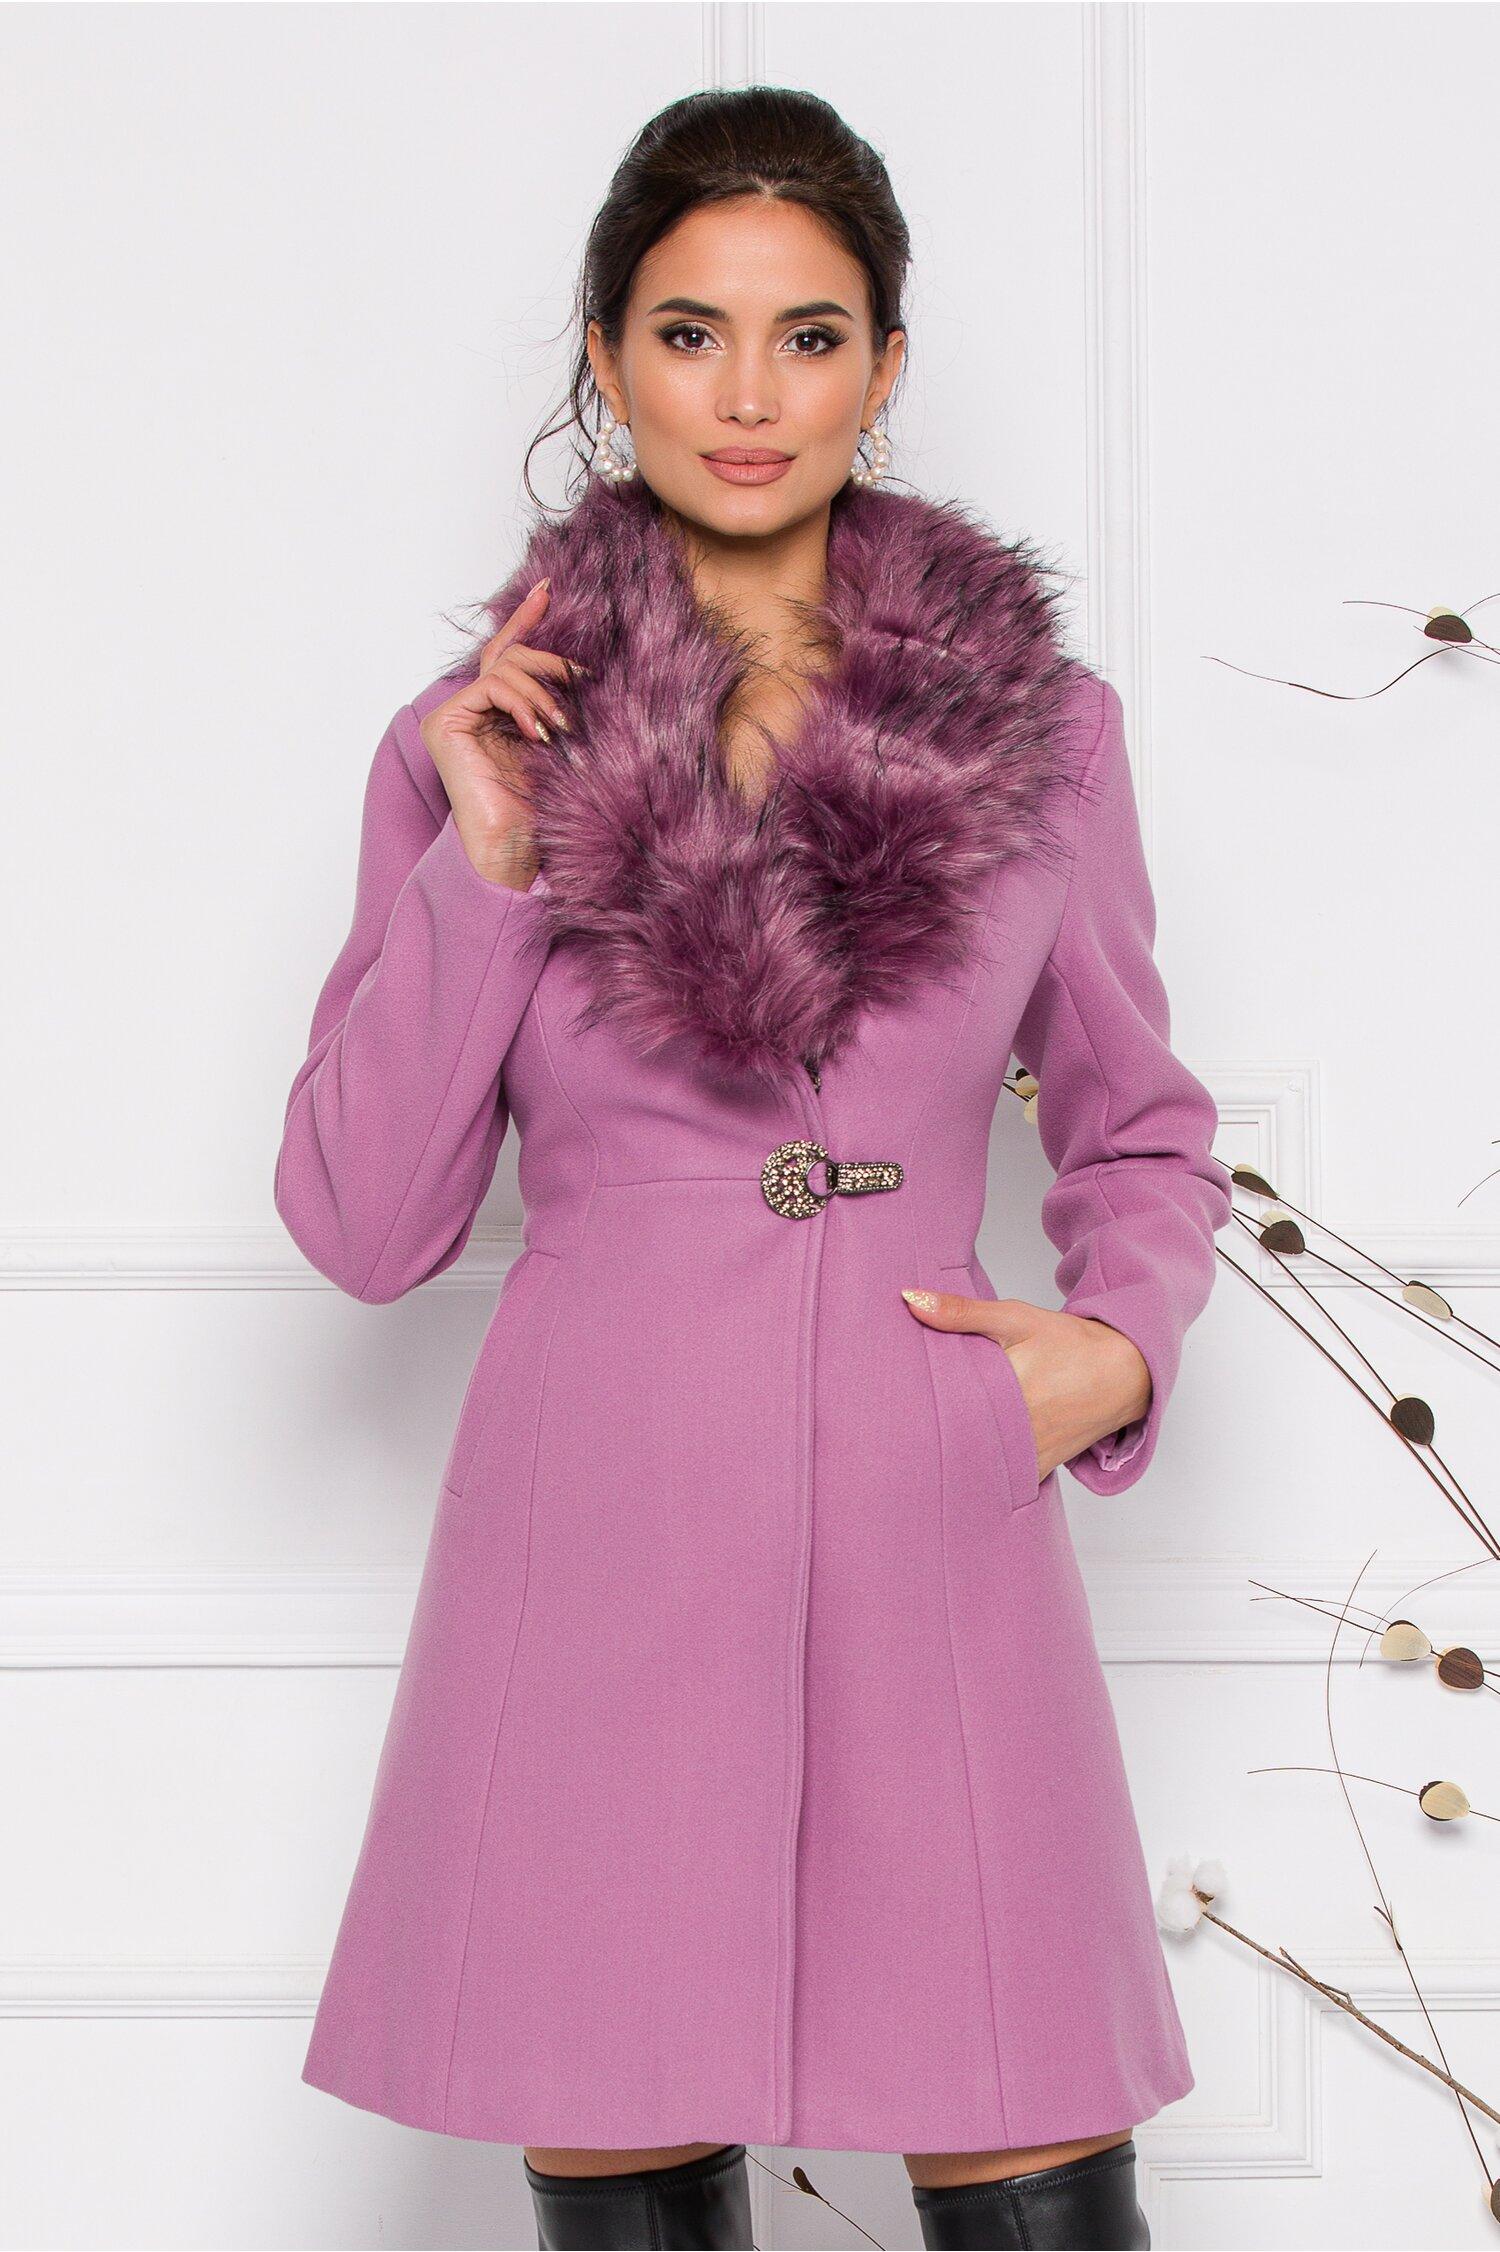 Palton MBG lila cu blanita la guler si sistem de inchidere tip clema accesorizata cu pietricele imagine